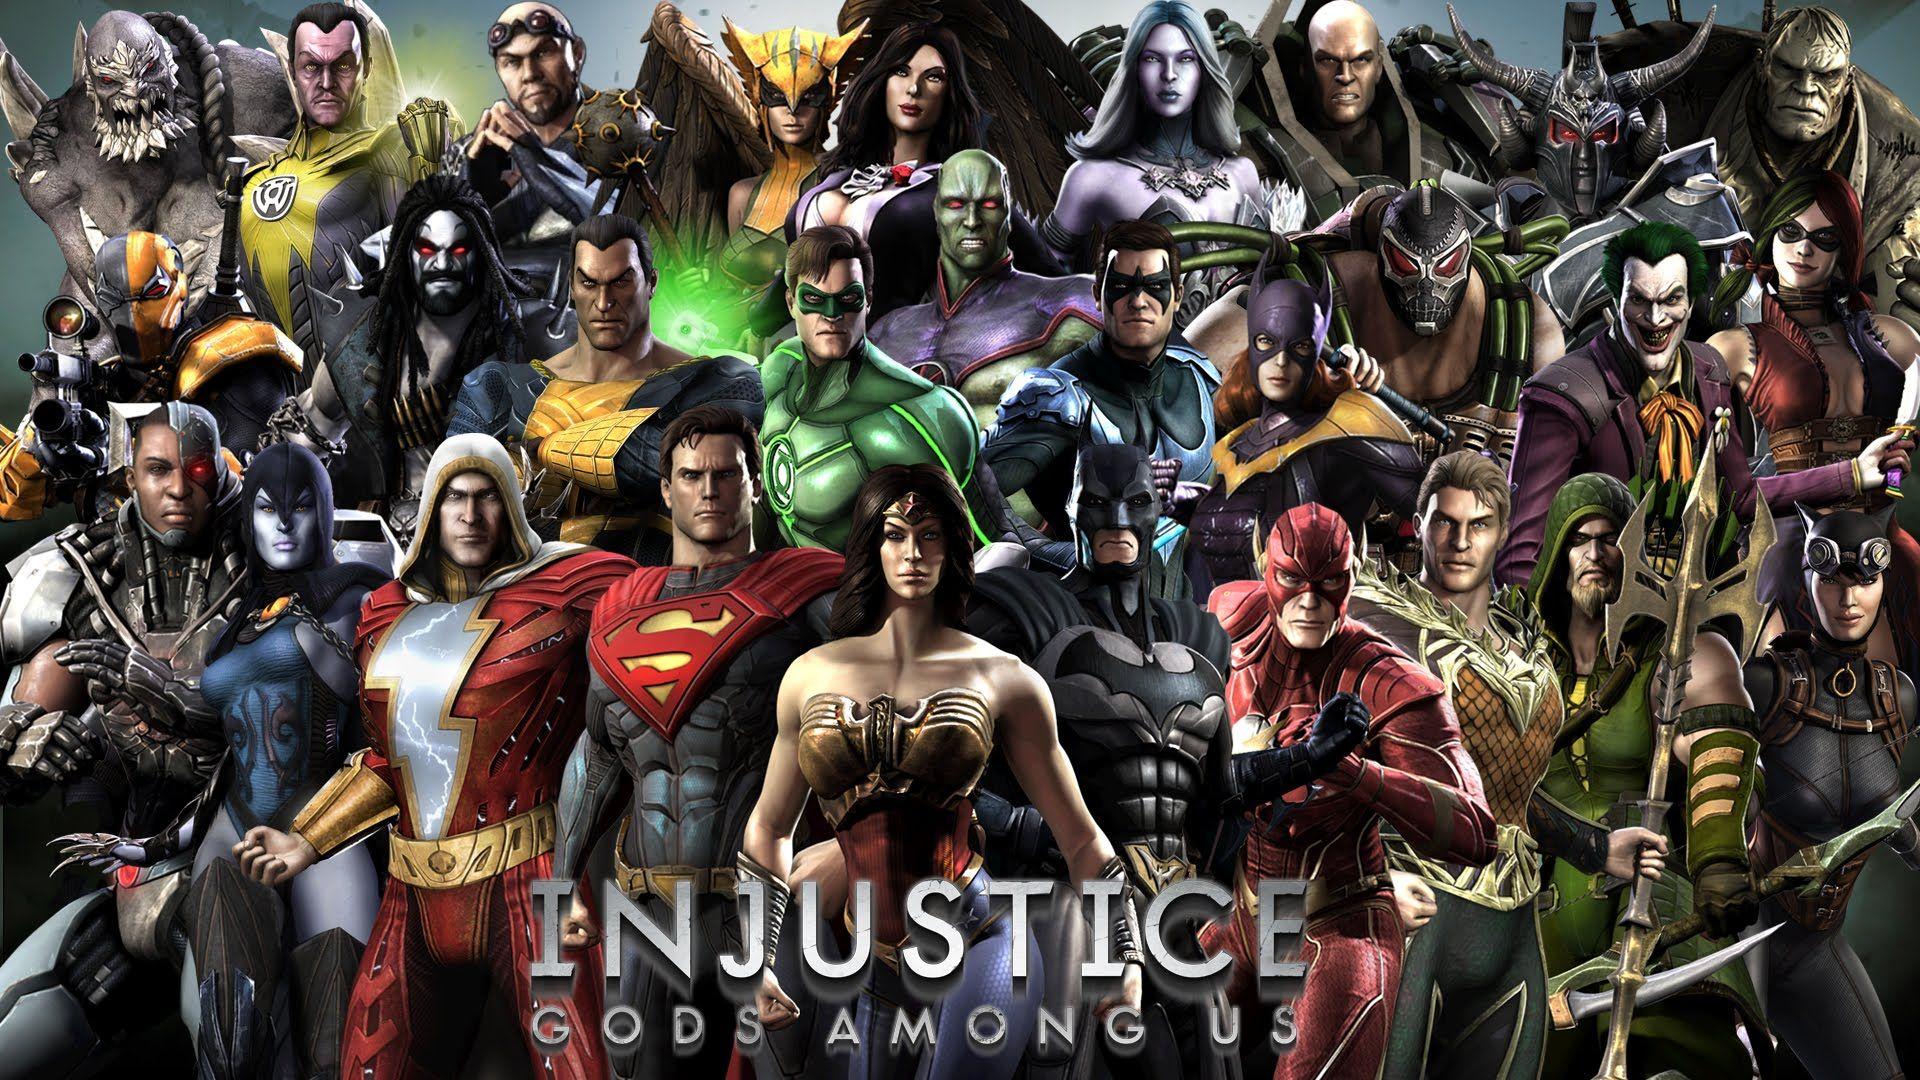 Injustice Gods Among Us 2 5 1 Mega Mod Apk Data Is Here Latest Injustice Injustice Game Cheat Online